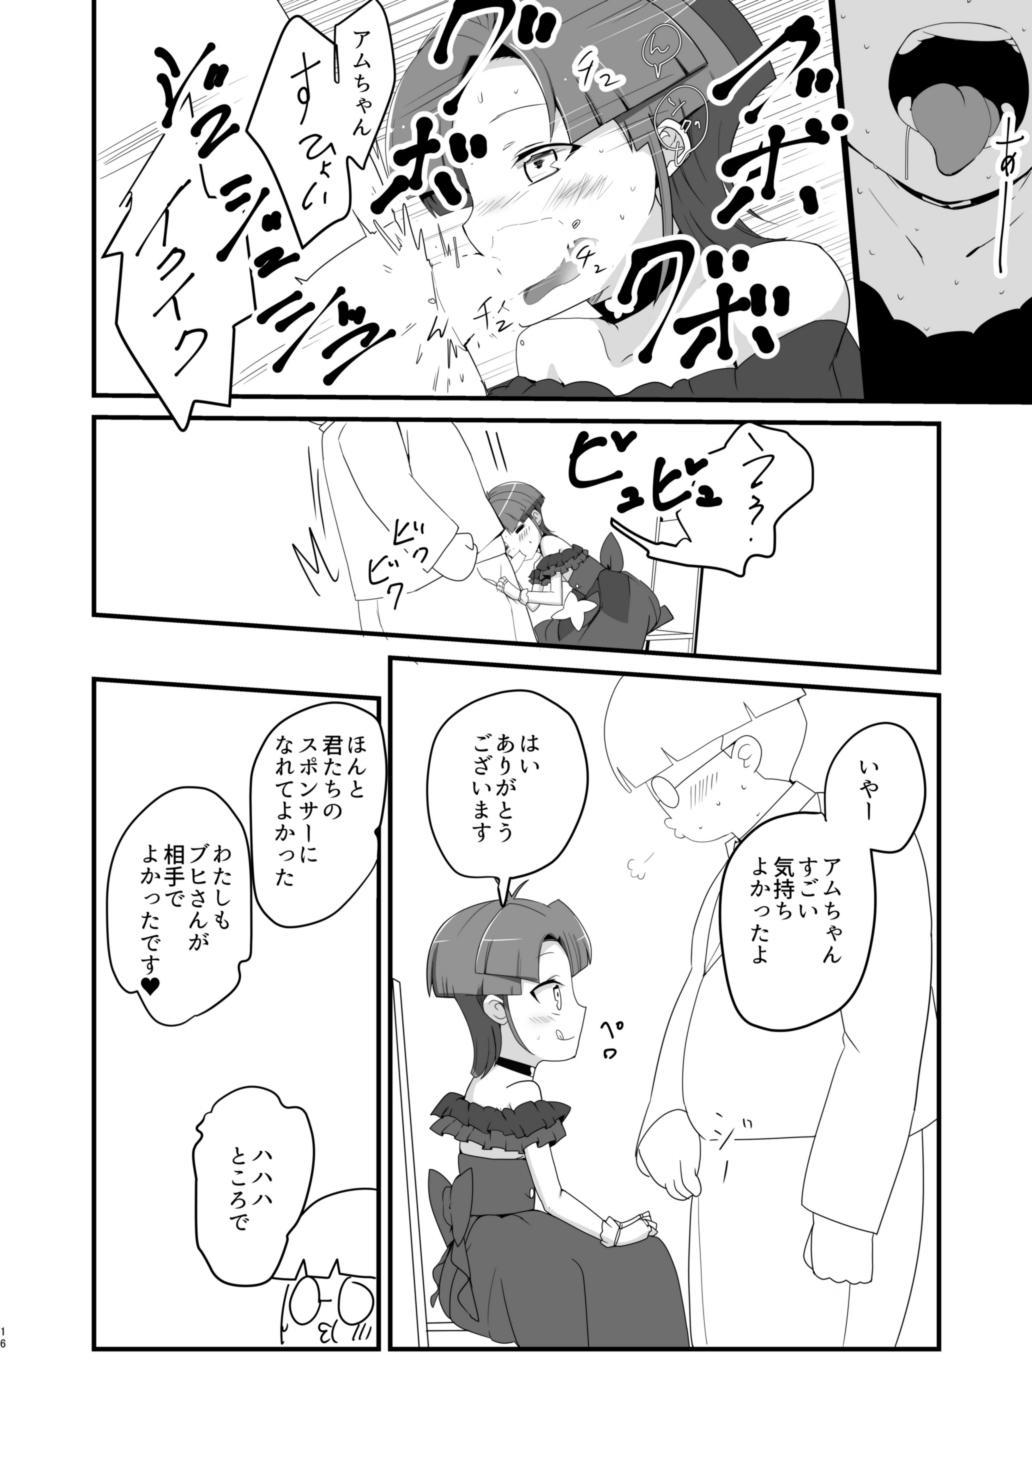 LunaAm O♂n♂n Akushuukai 14